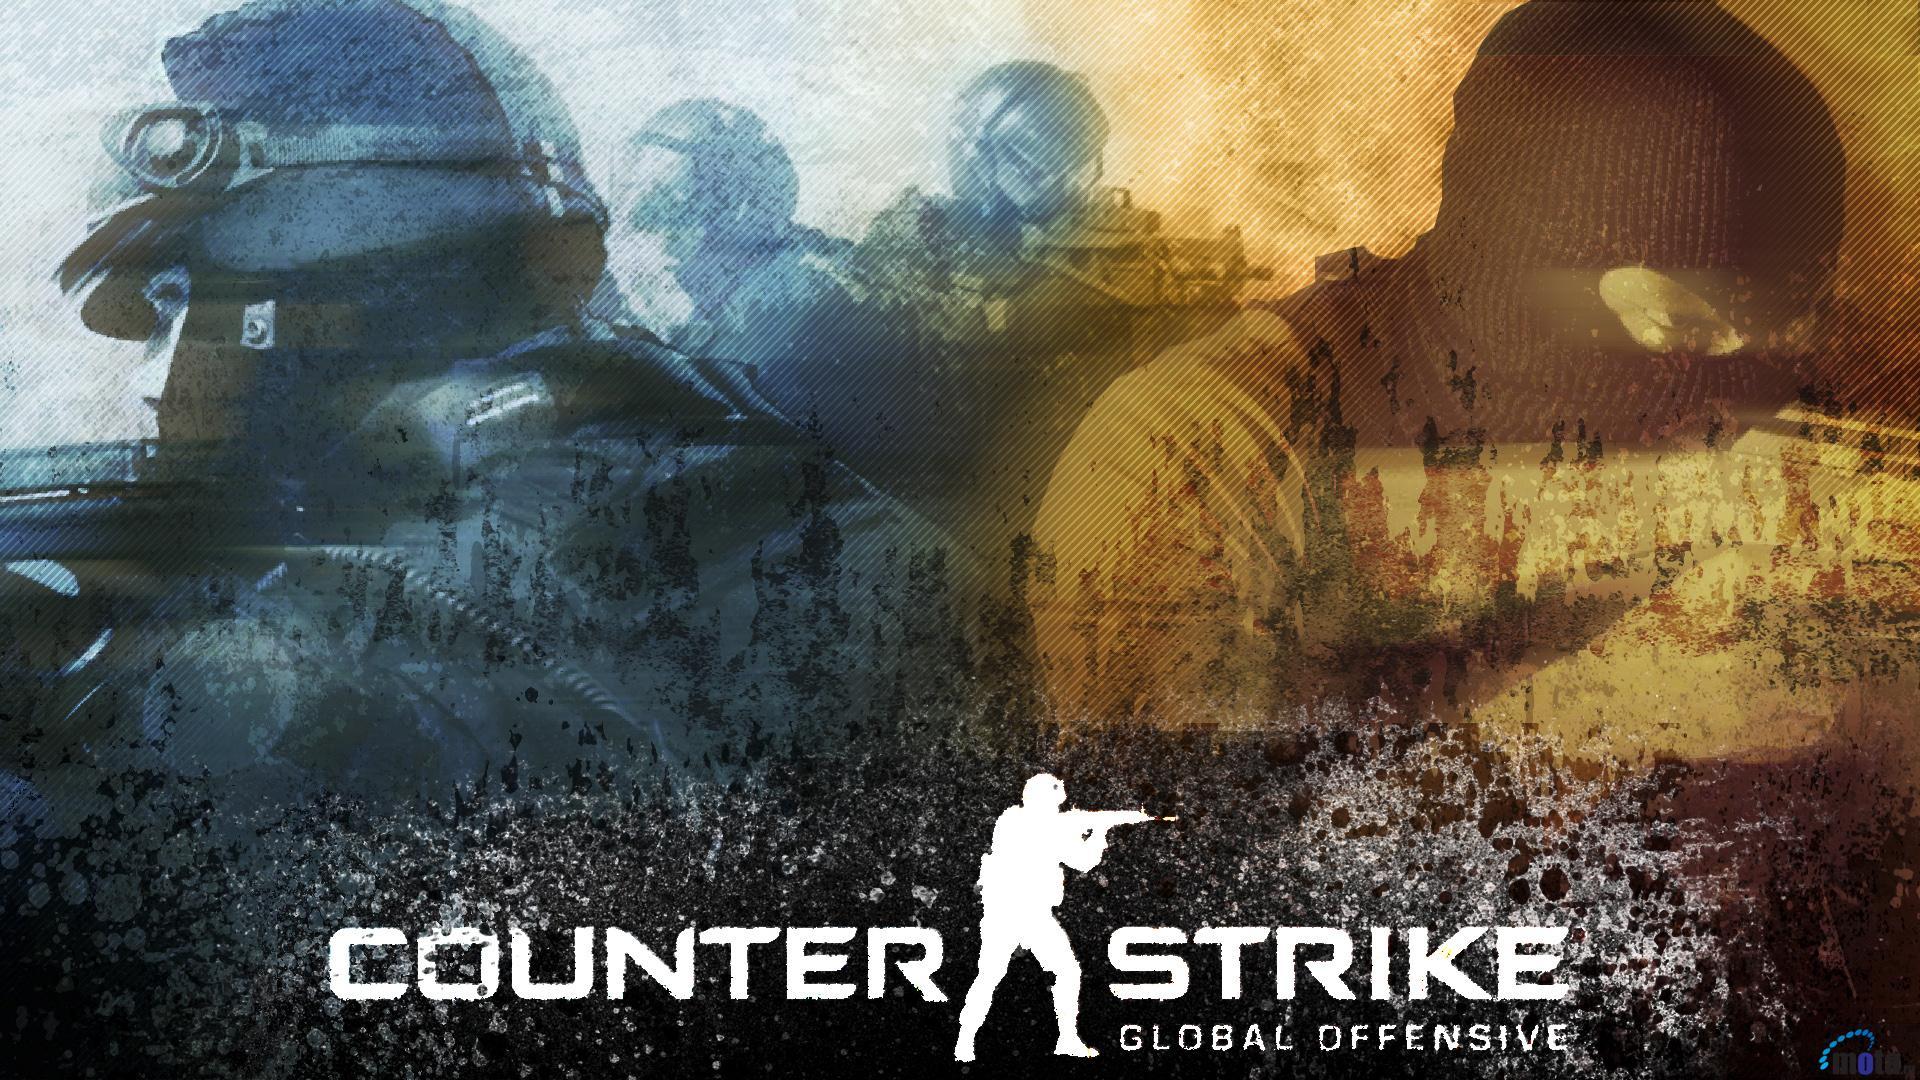 Download Wallpaper Counter Strike Global Offensive 1920 x 1080 HDTV 1920x1080